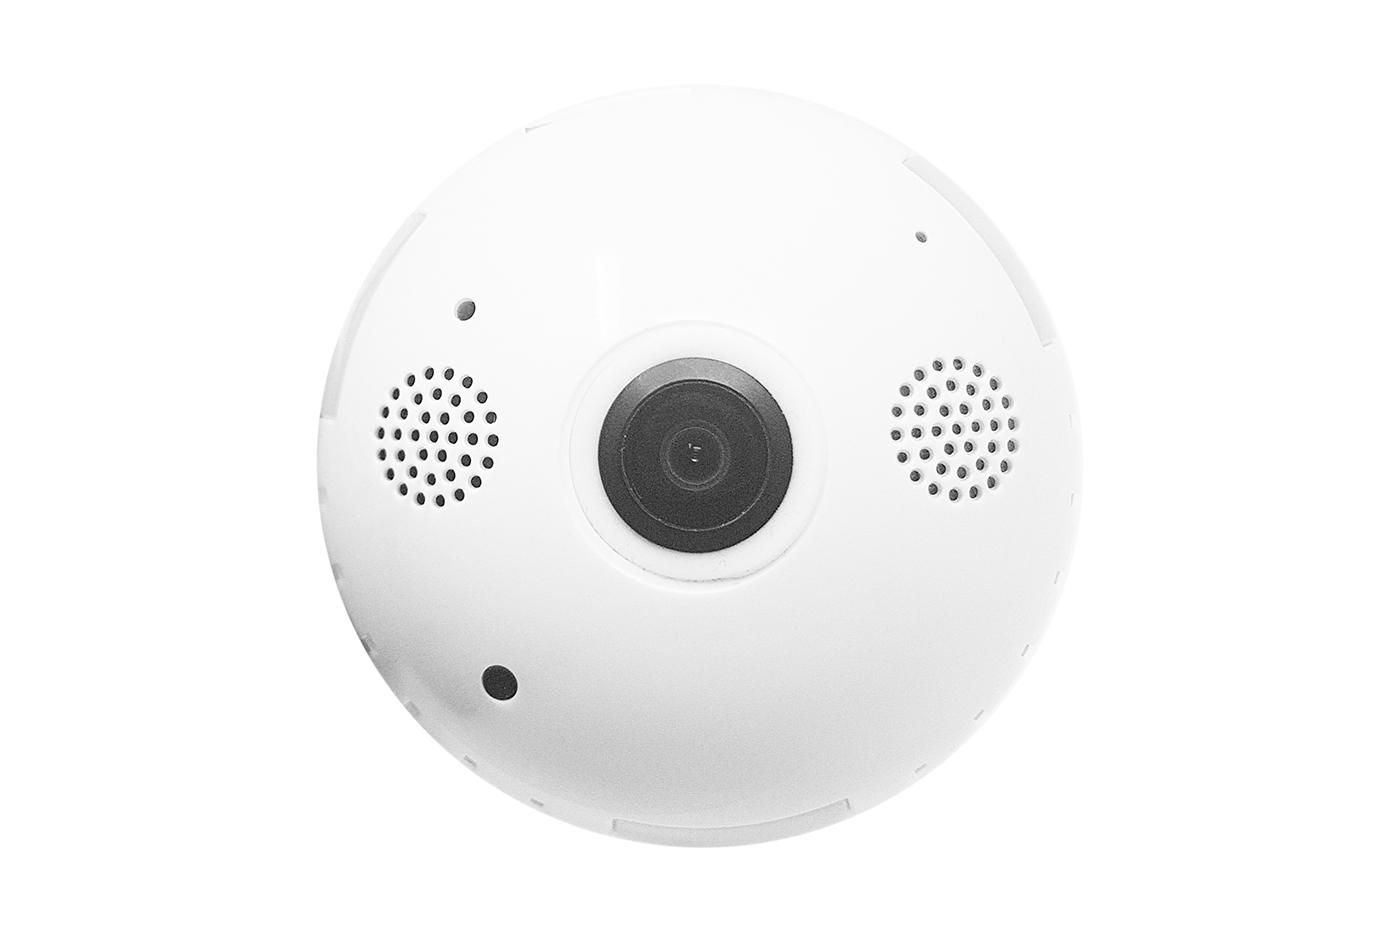 Telecamera Nascosta Da Esterno : Bes wi fi ip beselettronica telecamera lampadina